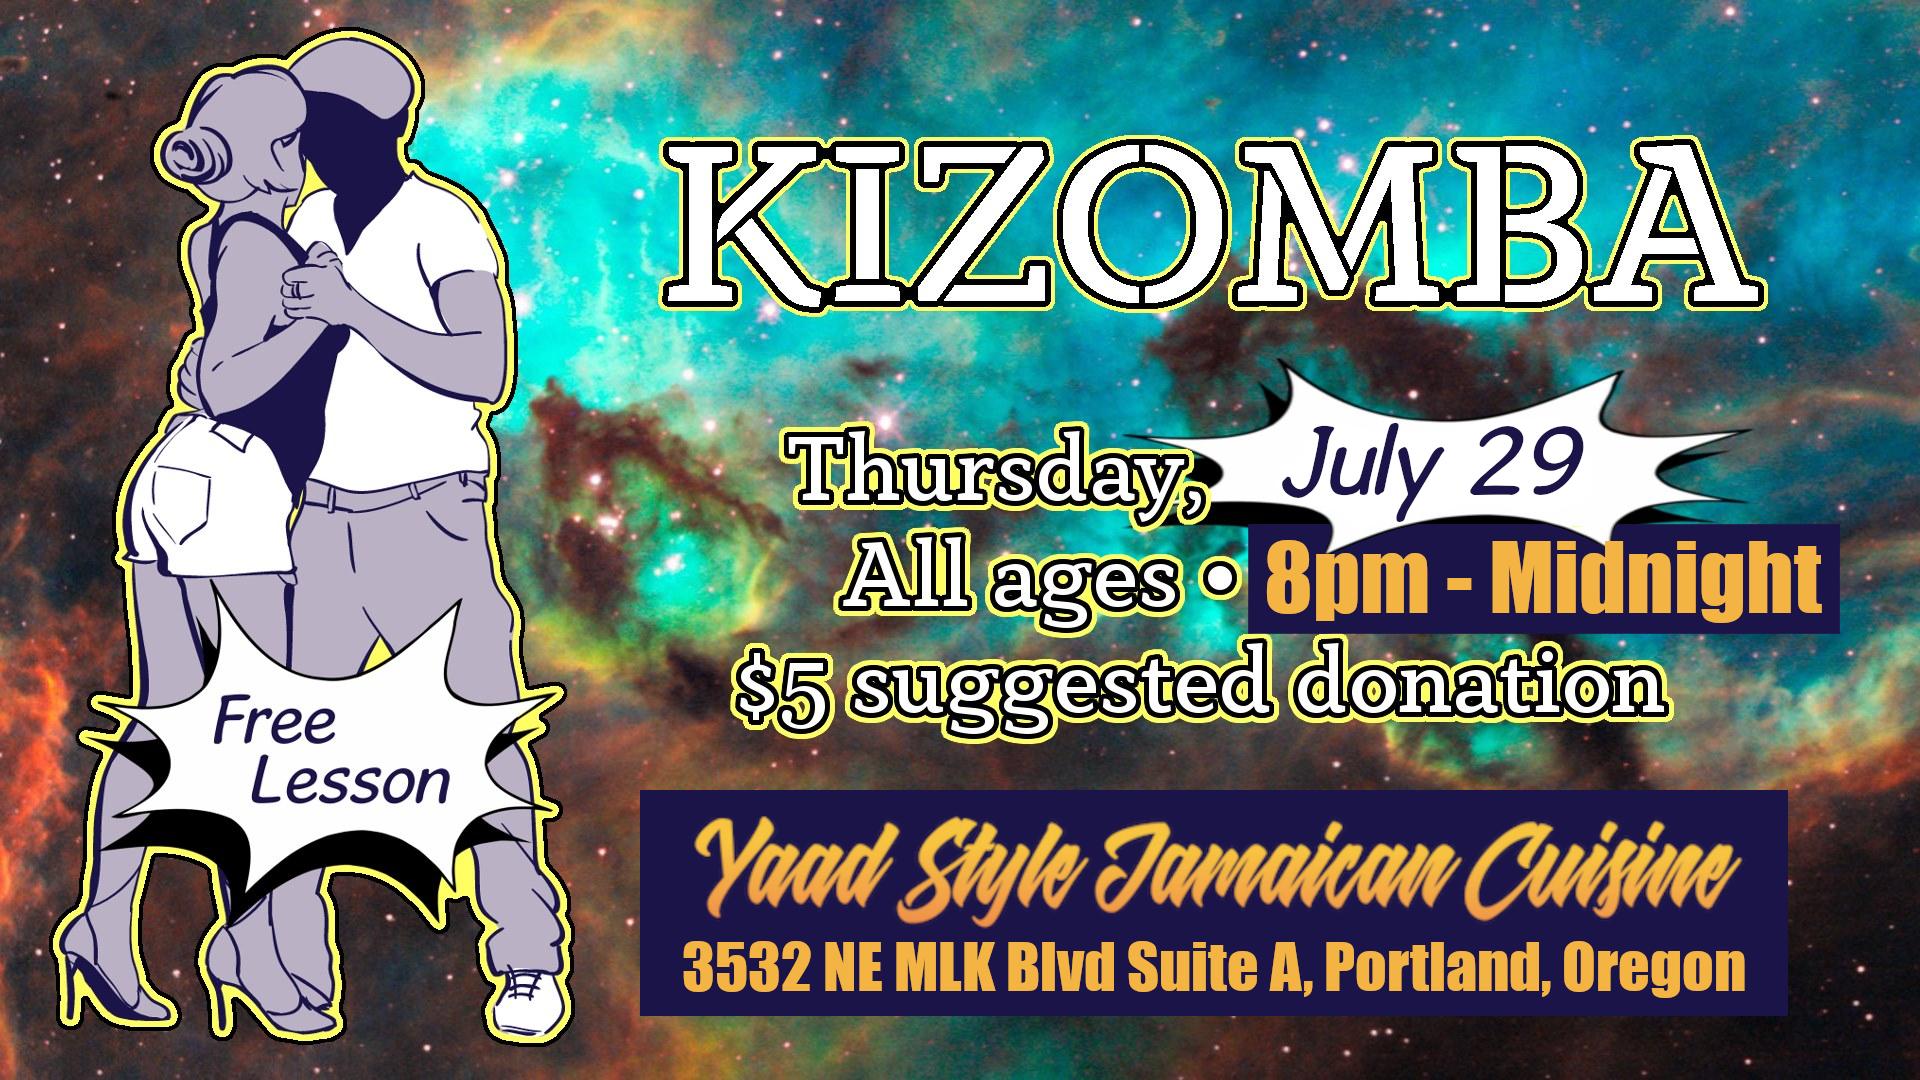 Kizomba Social Returns